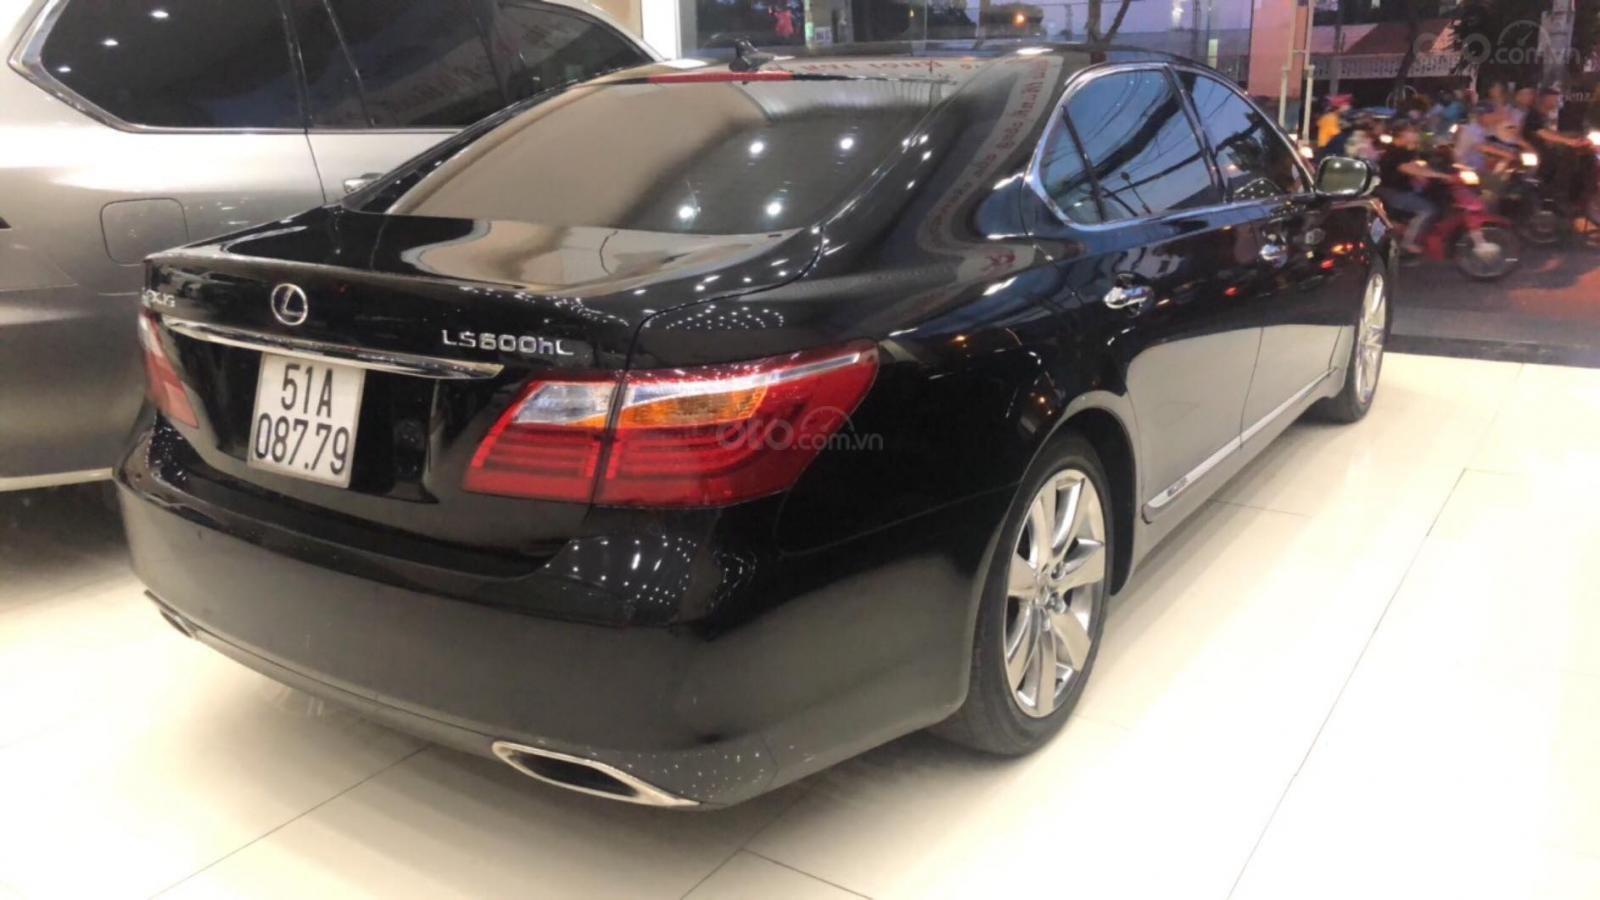 Bán xe Lexus LS600HL SX 2011 (5)